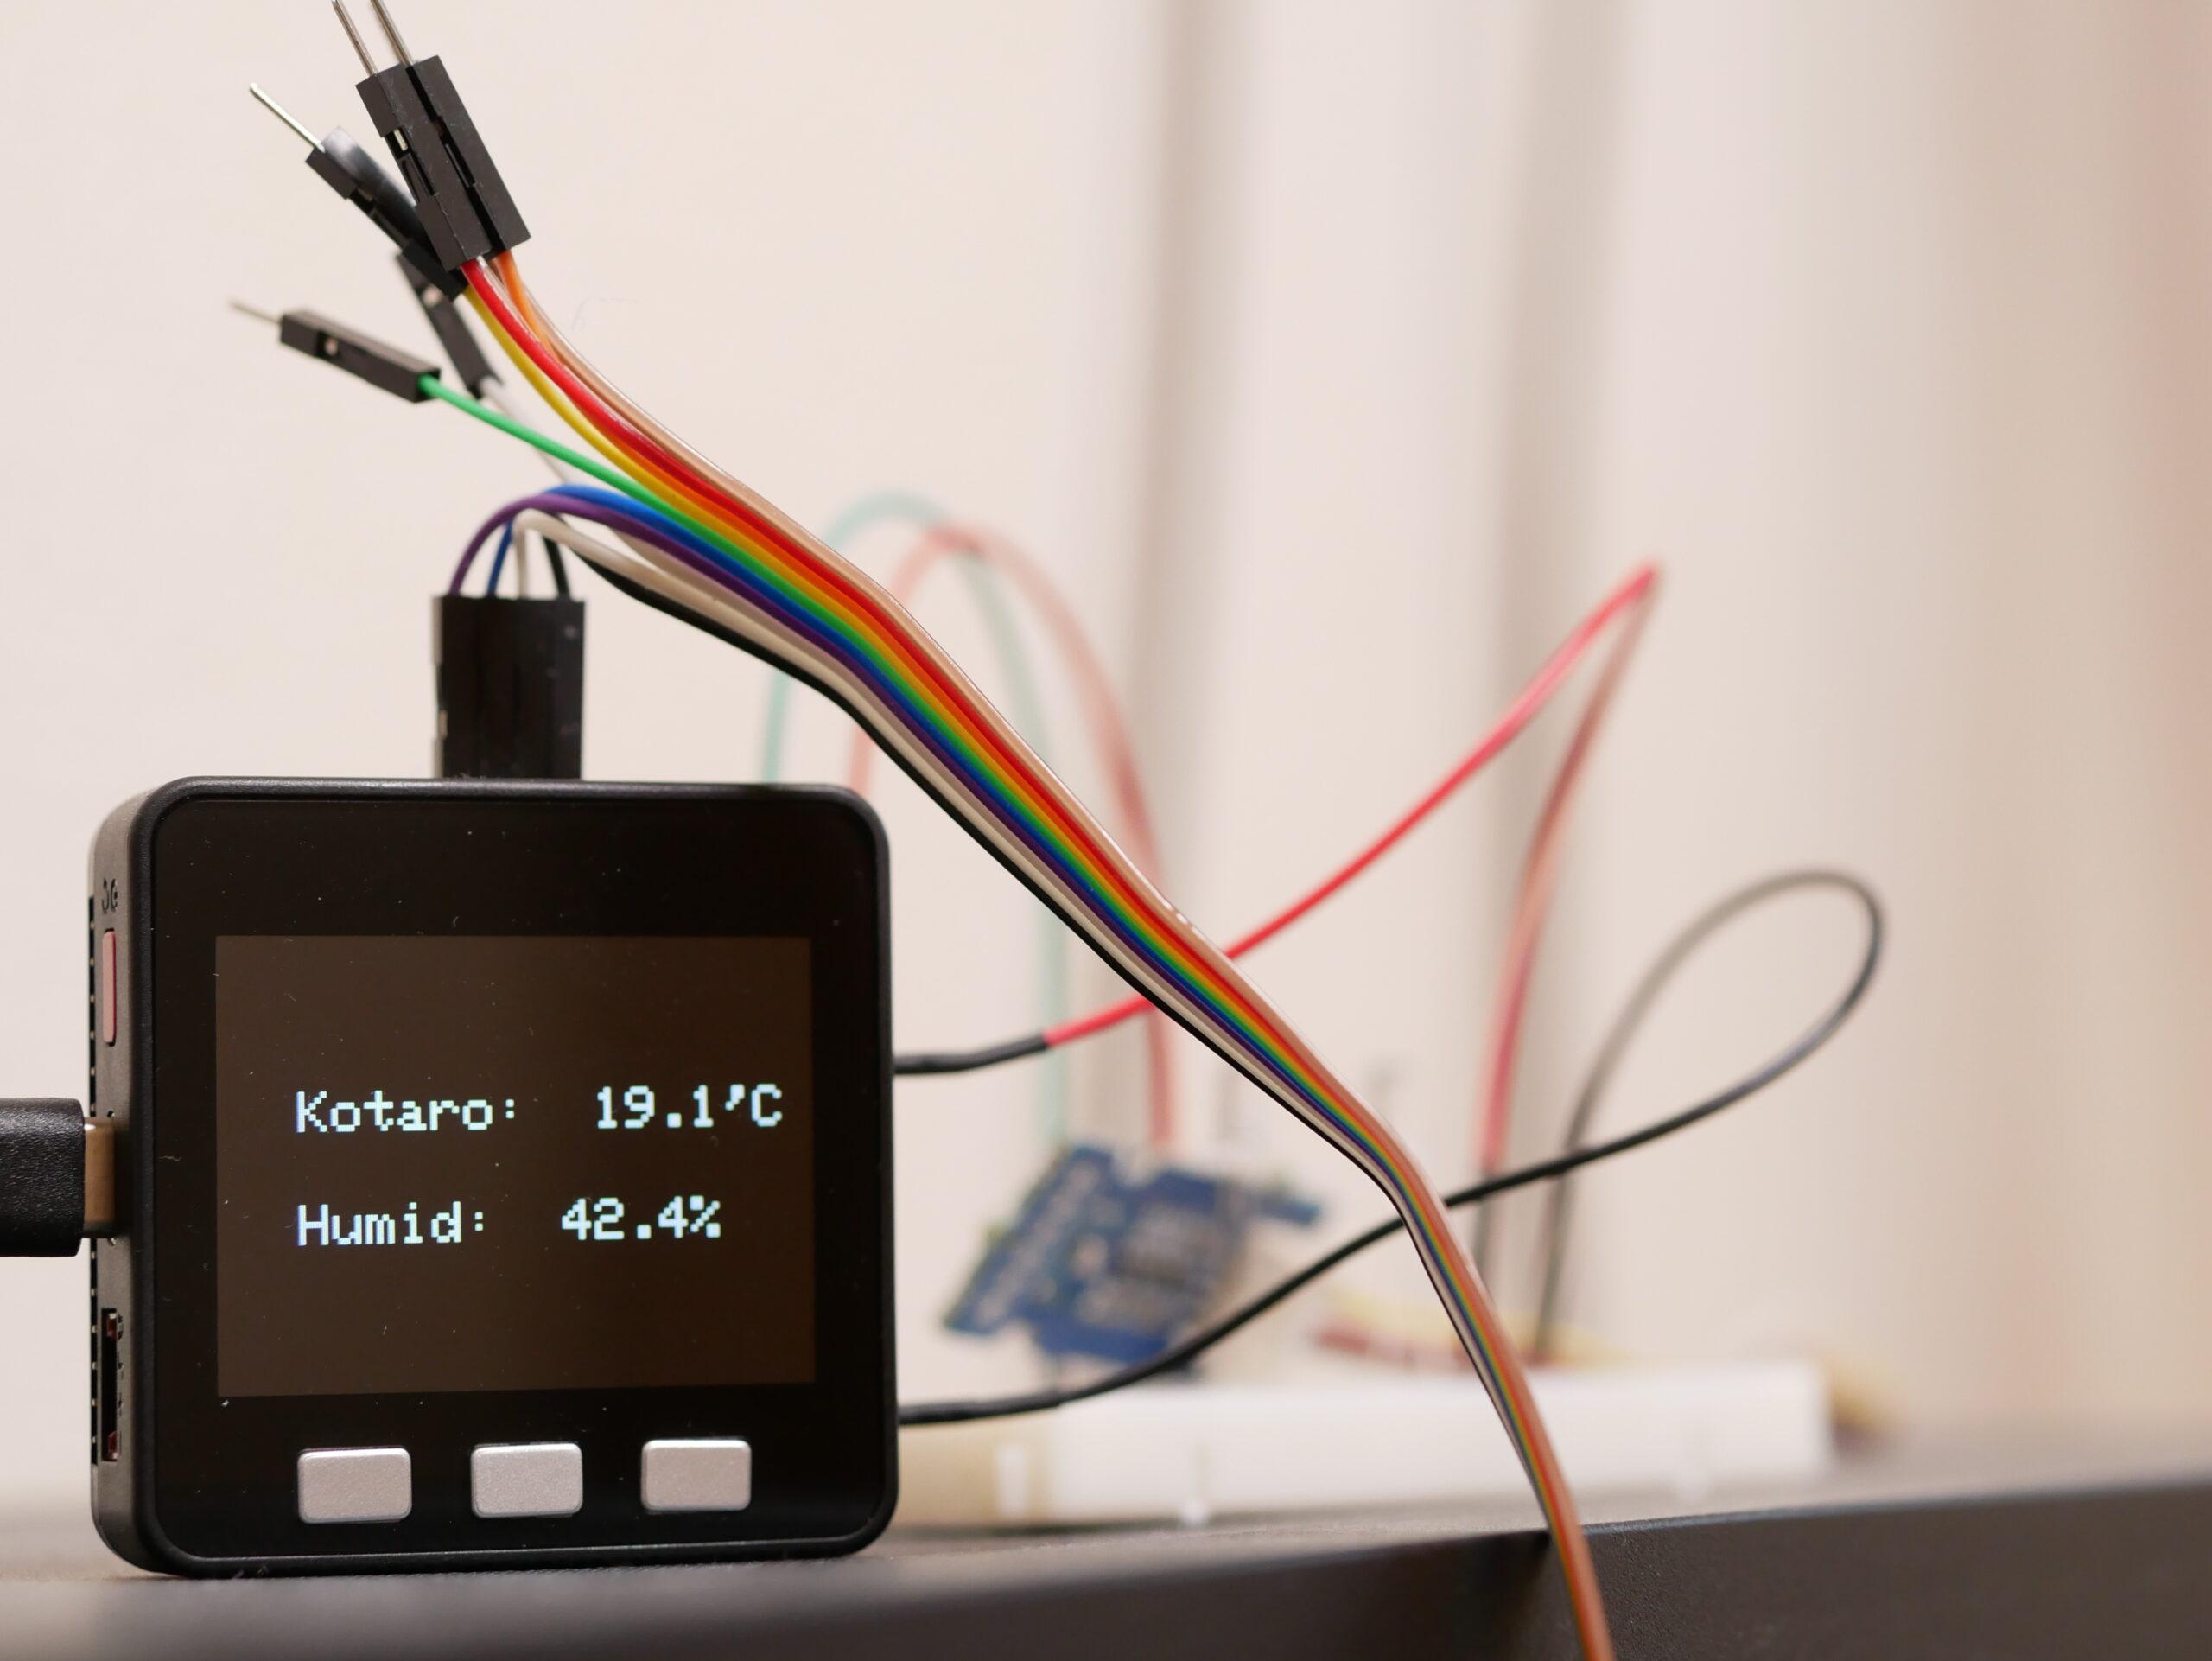 M5Stackで温湿度計を作る5つの手順